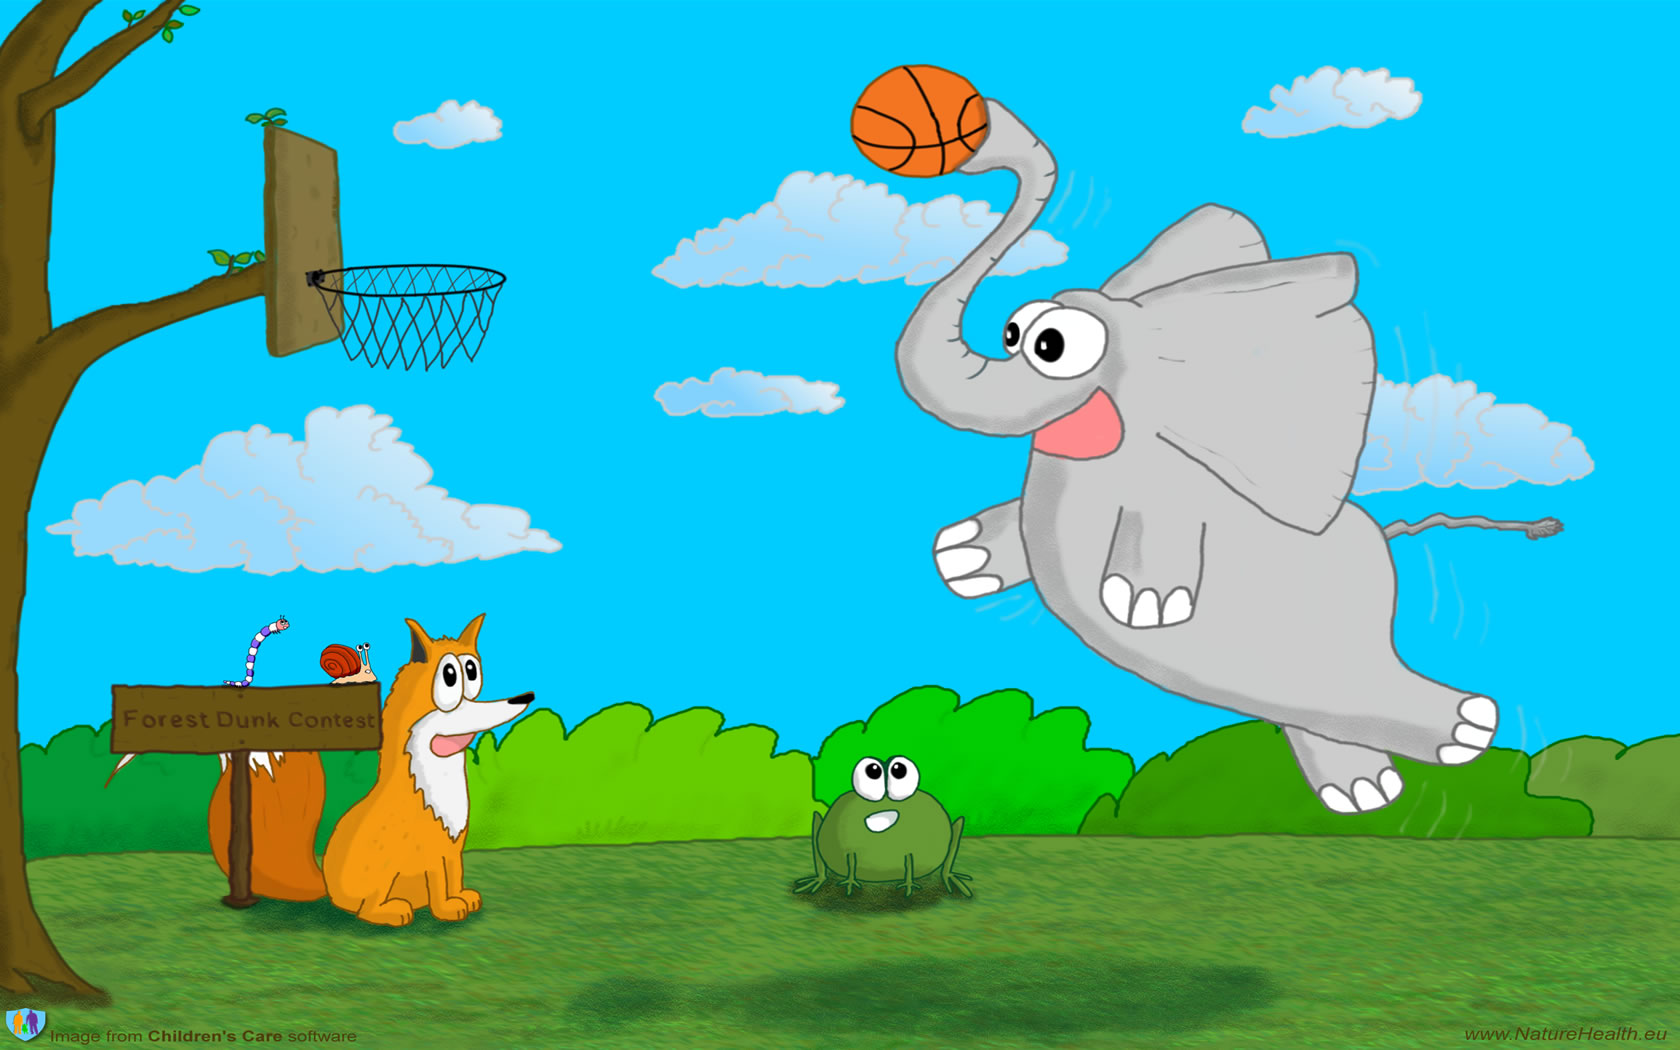 Basketball Kids Wallpaper: [75+] Free Wallpapers For Kids On WallpaperSafari